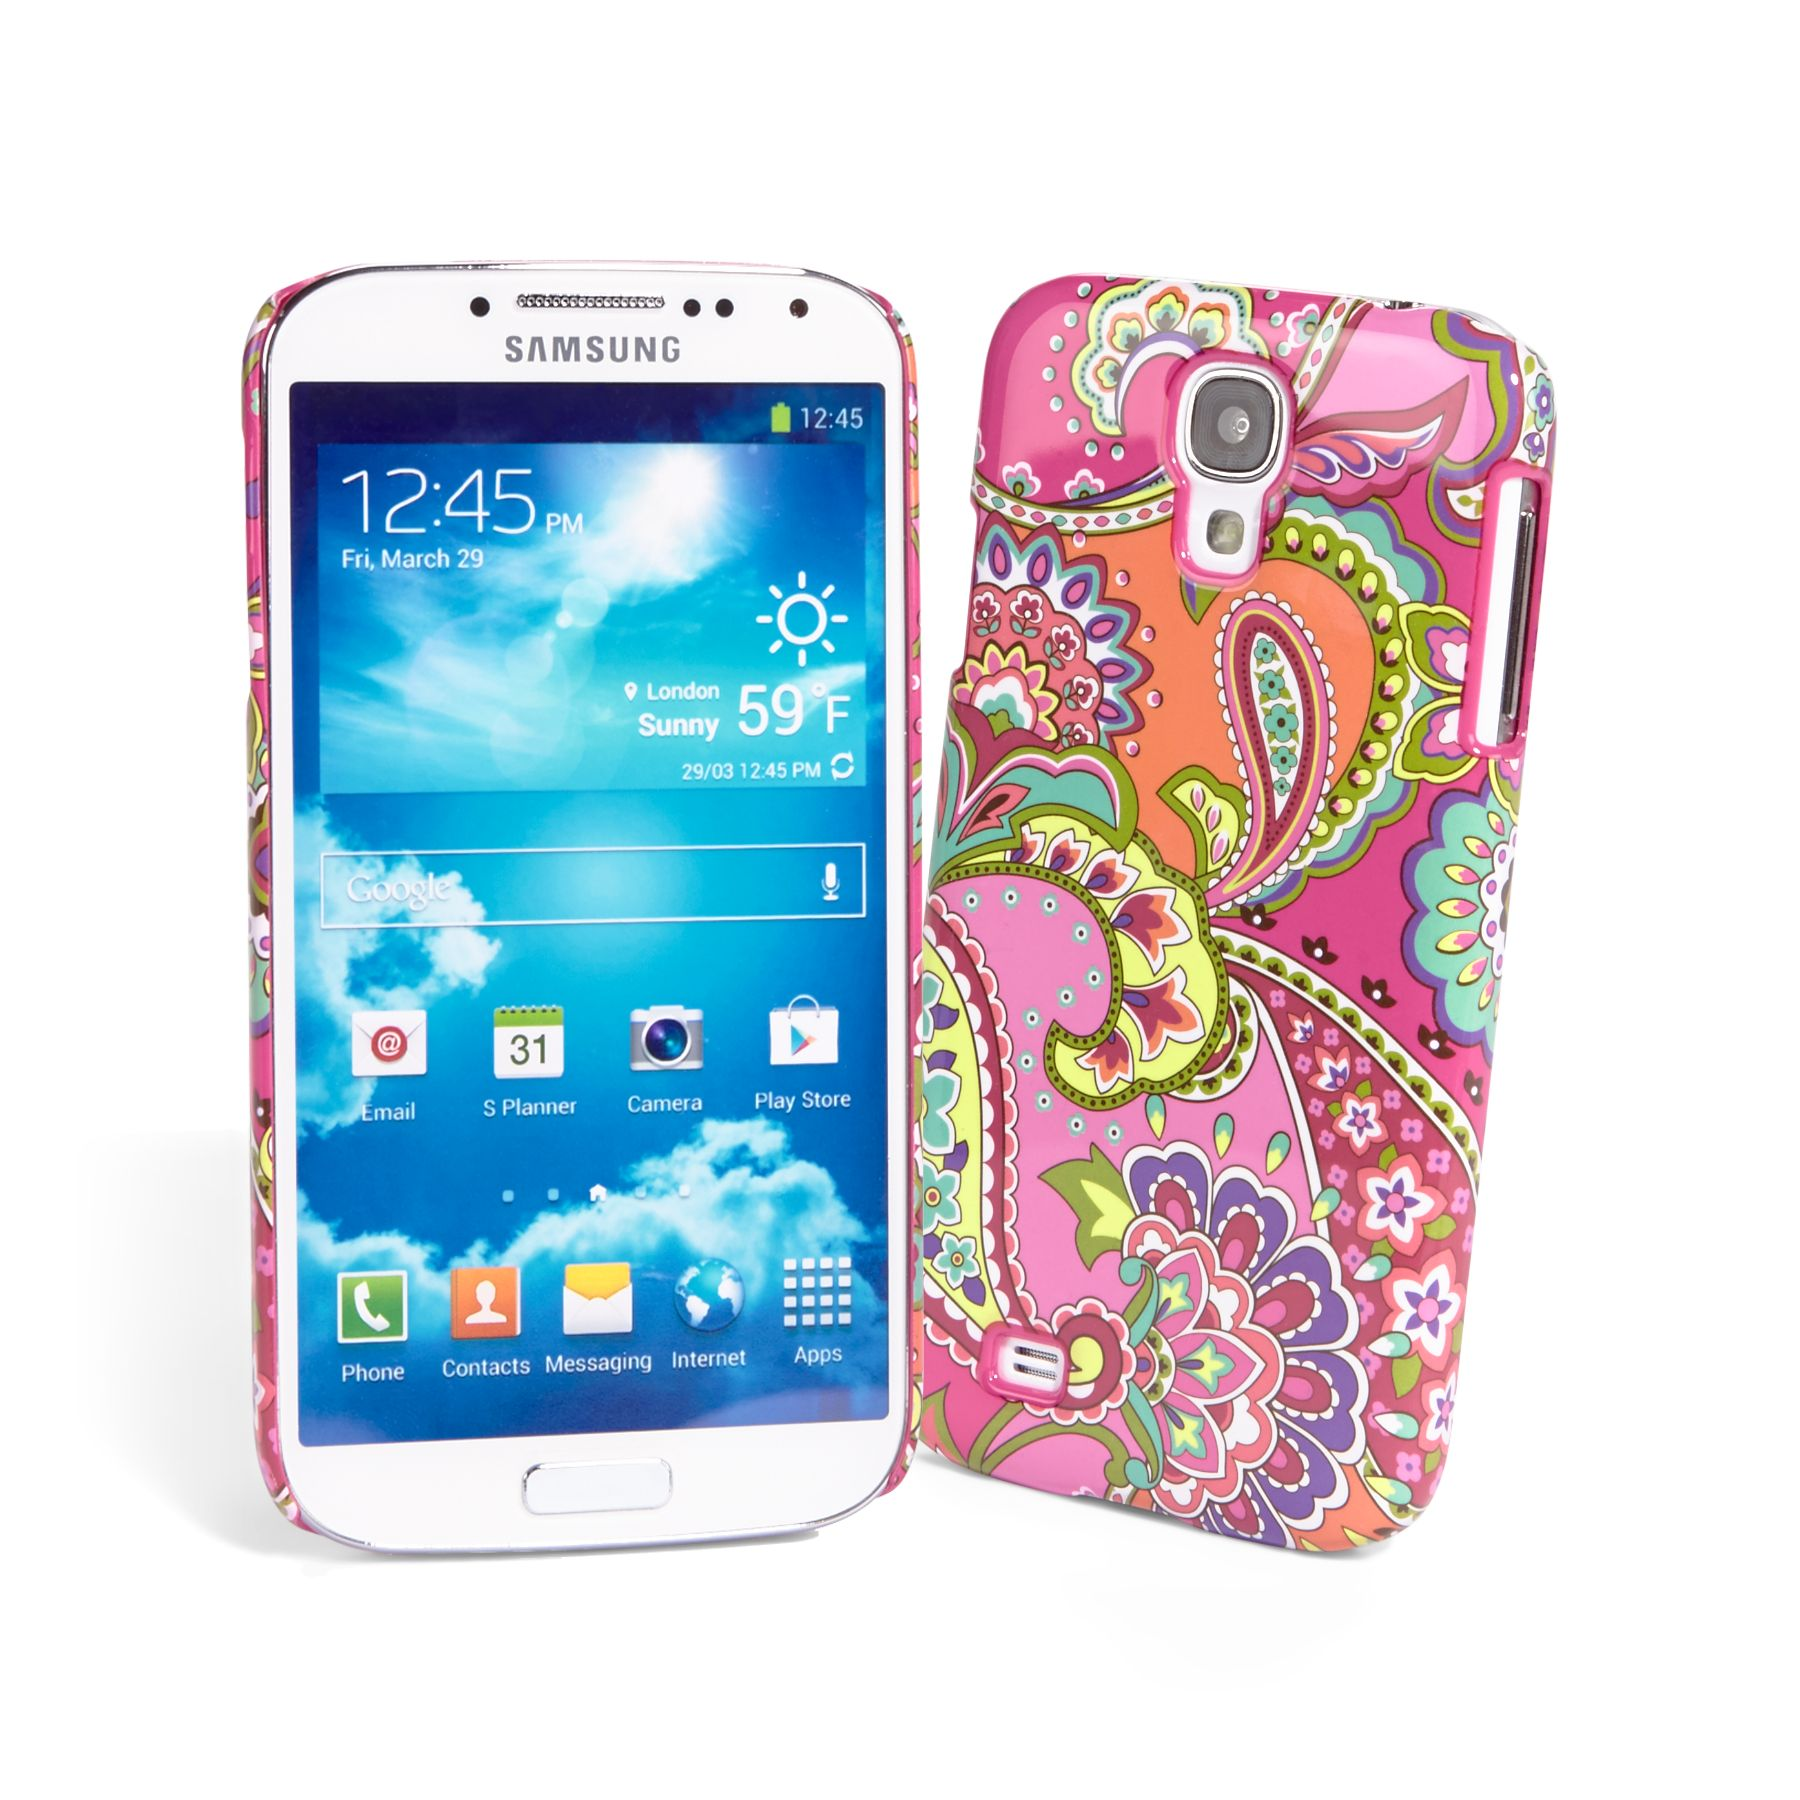 Vera Bradley Snap on Case for Samsung Galaxy S 4 in Pink Swirls